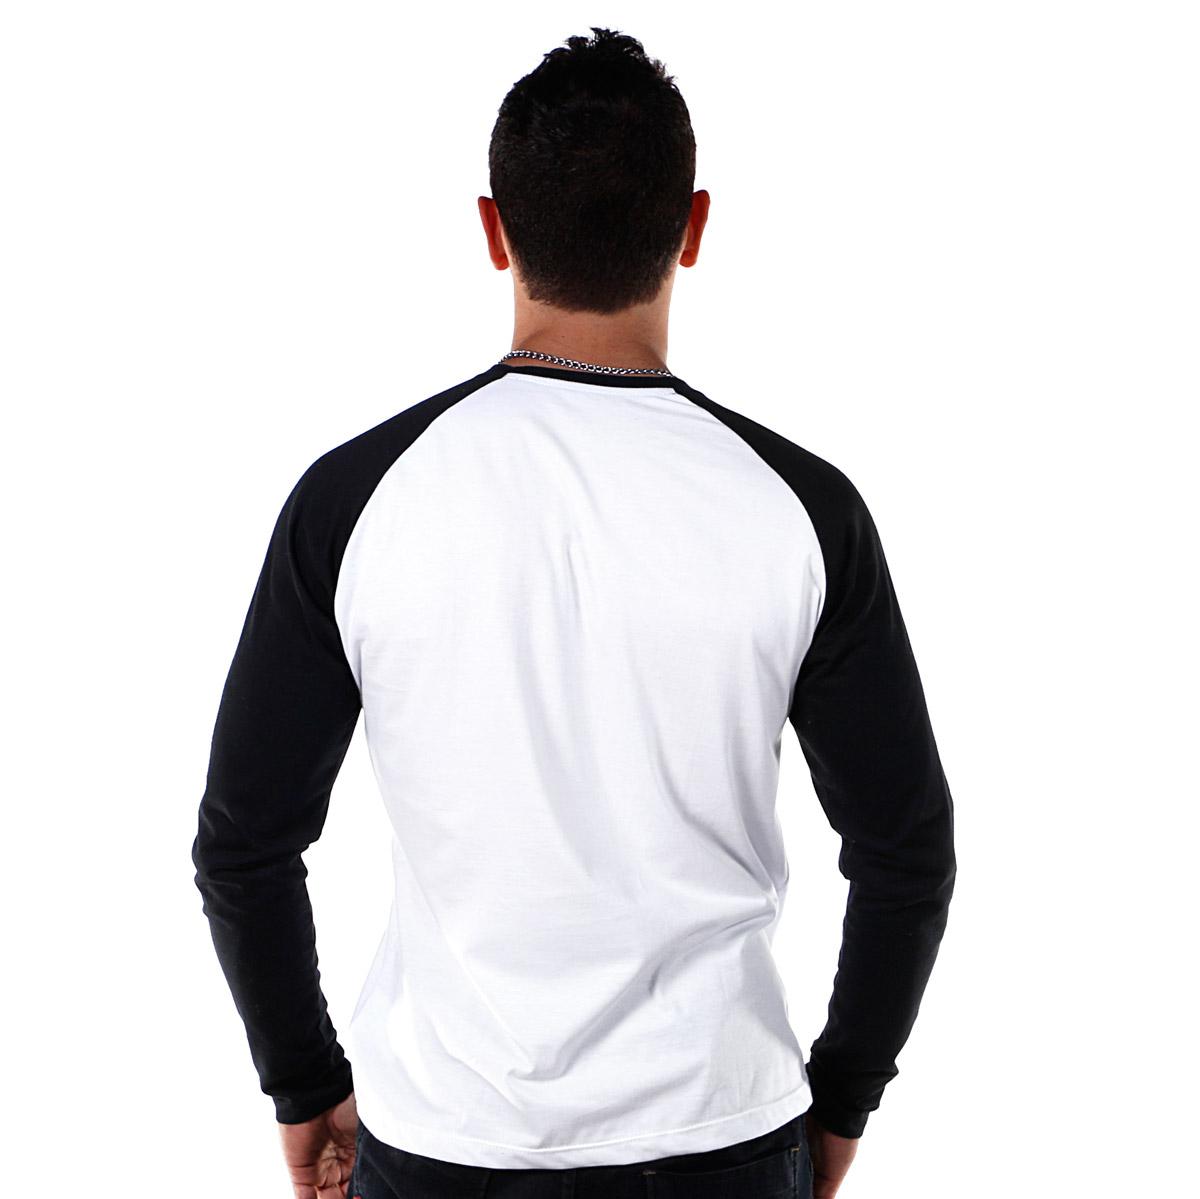 Camiseta Manga Longa Raglan Masculina Fresno Olho